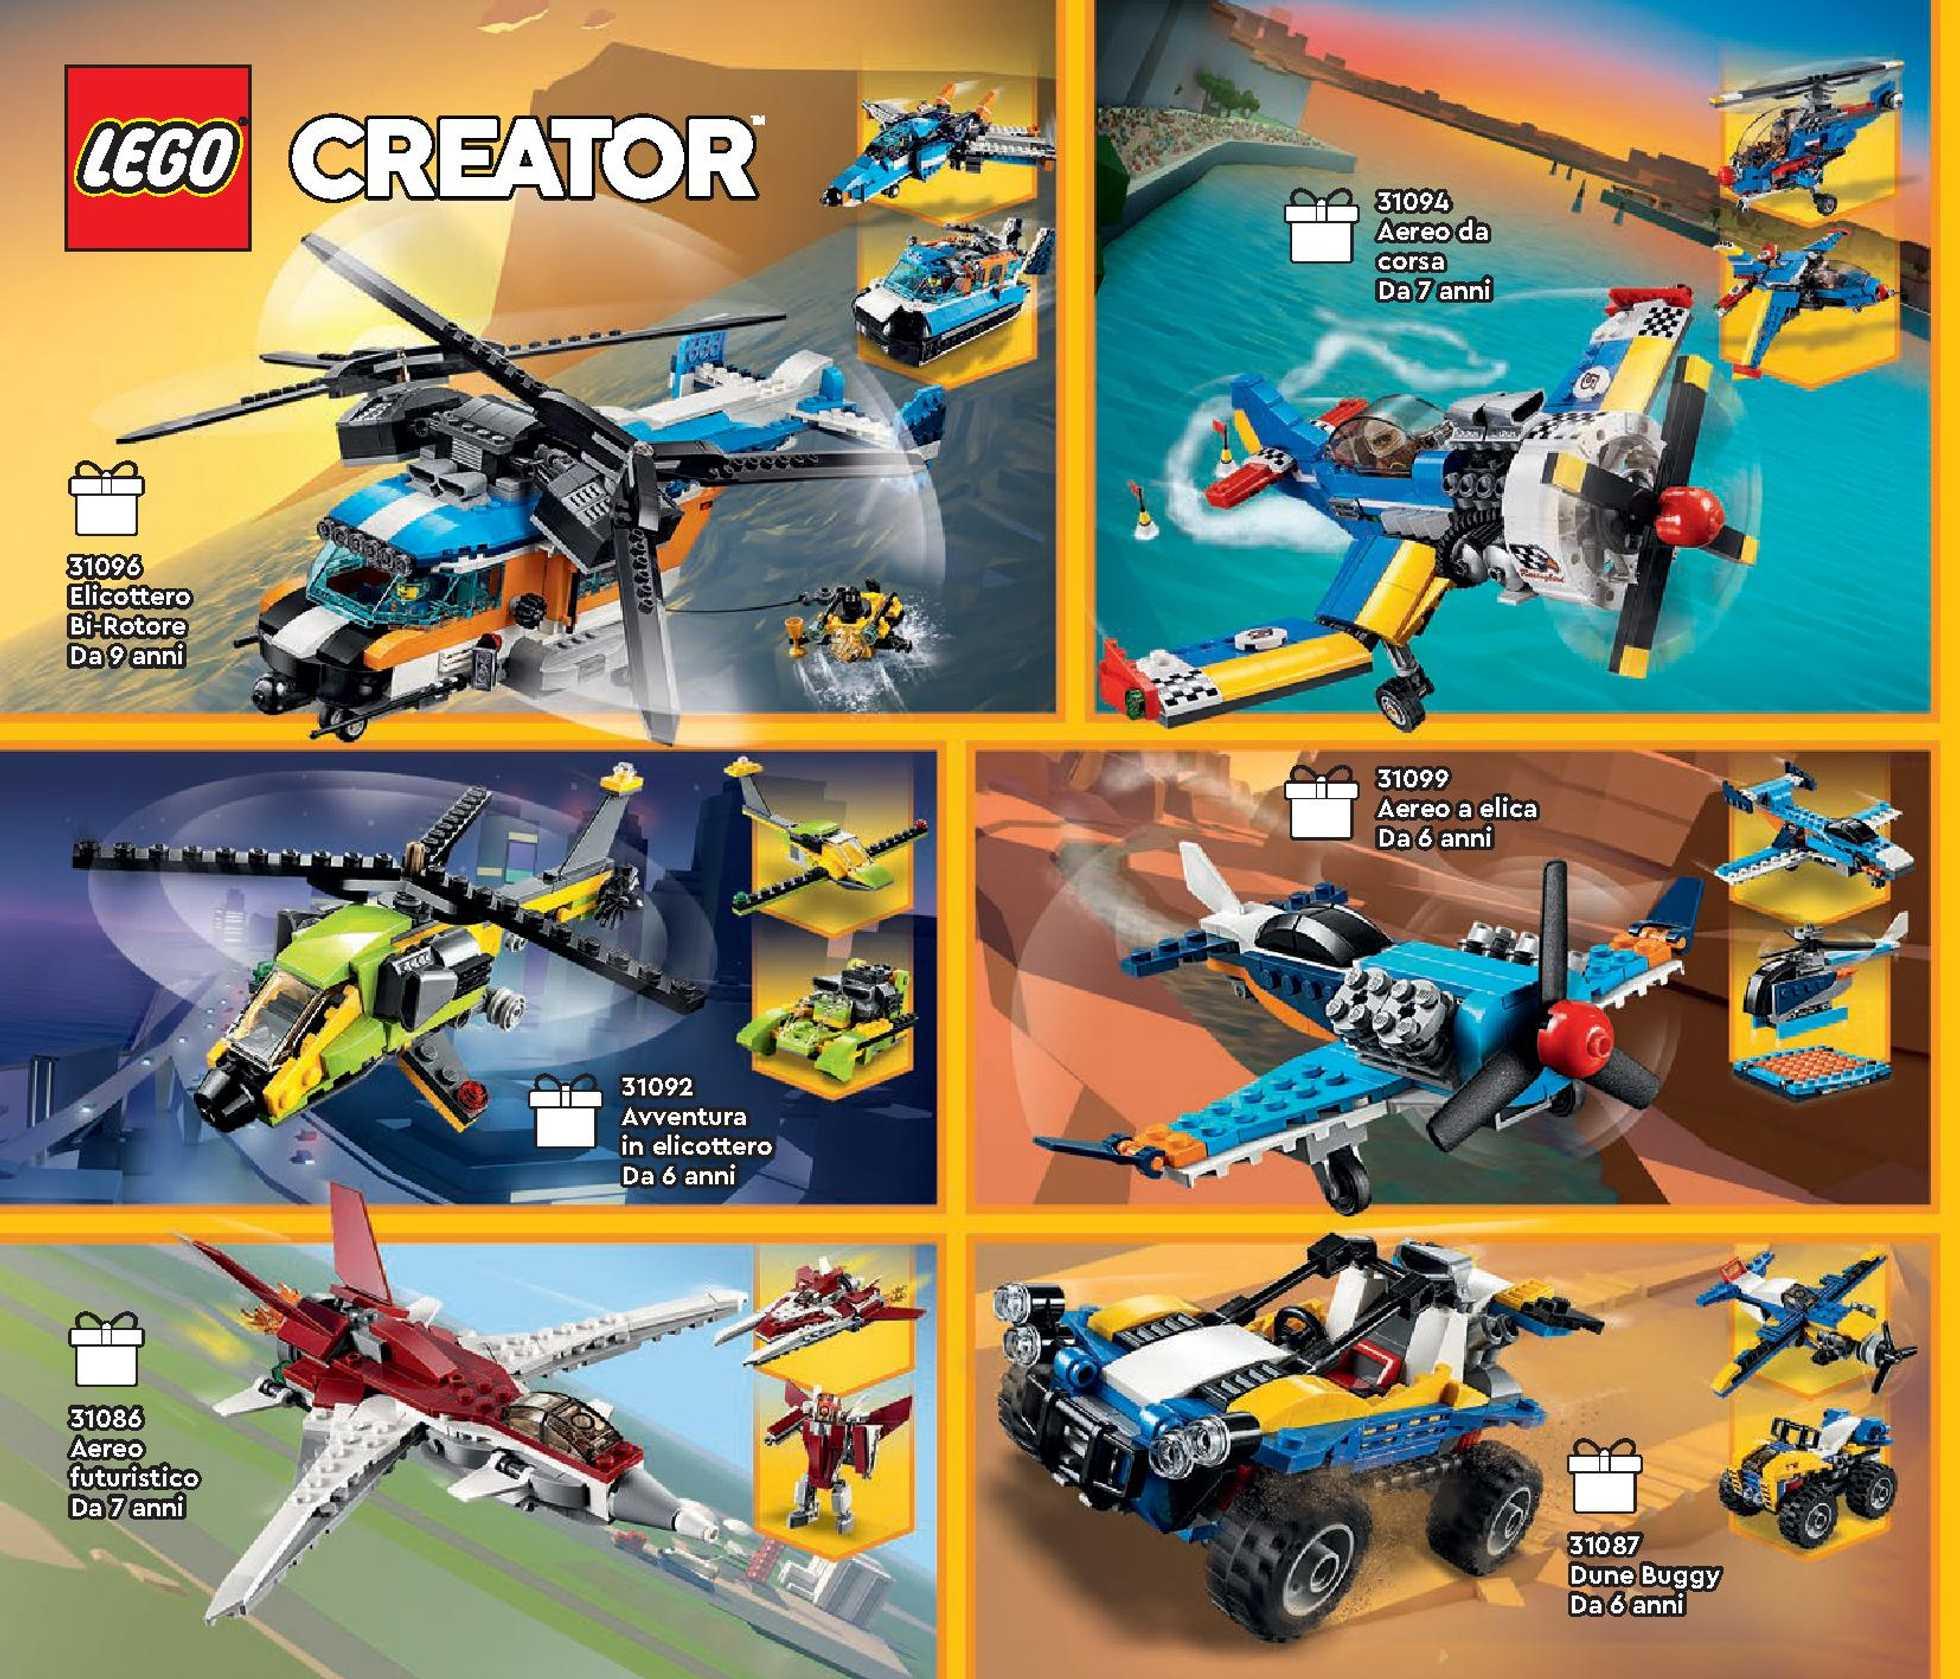 Lego - offerte valide dal 01.07.2020 al 31.12.2020 - pagina 2.